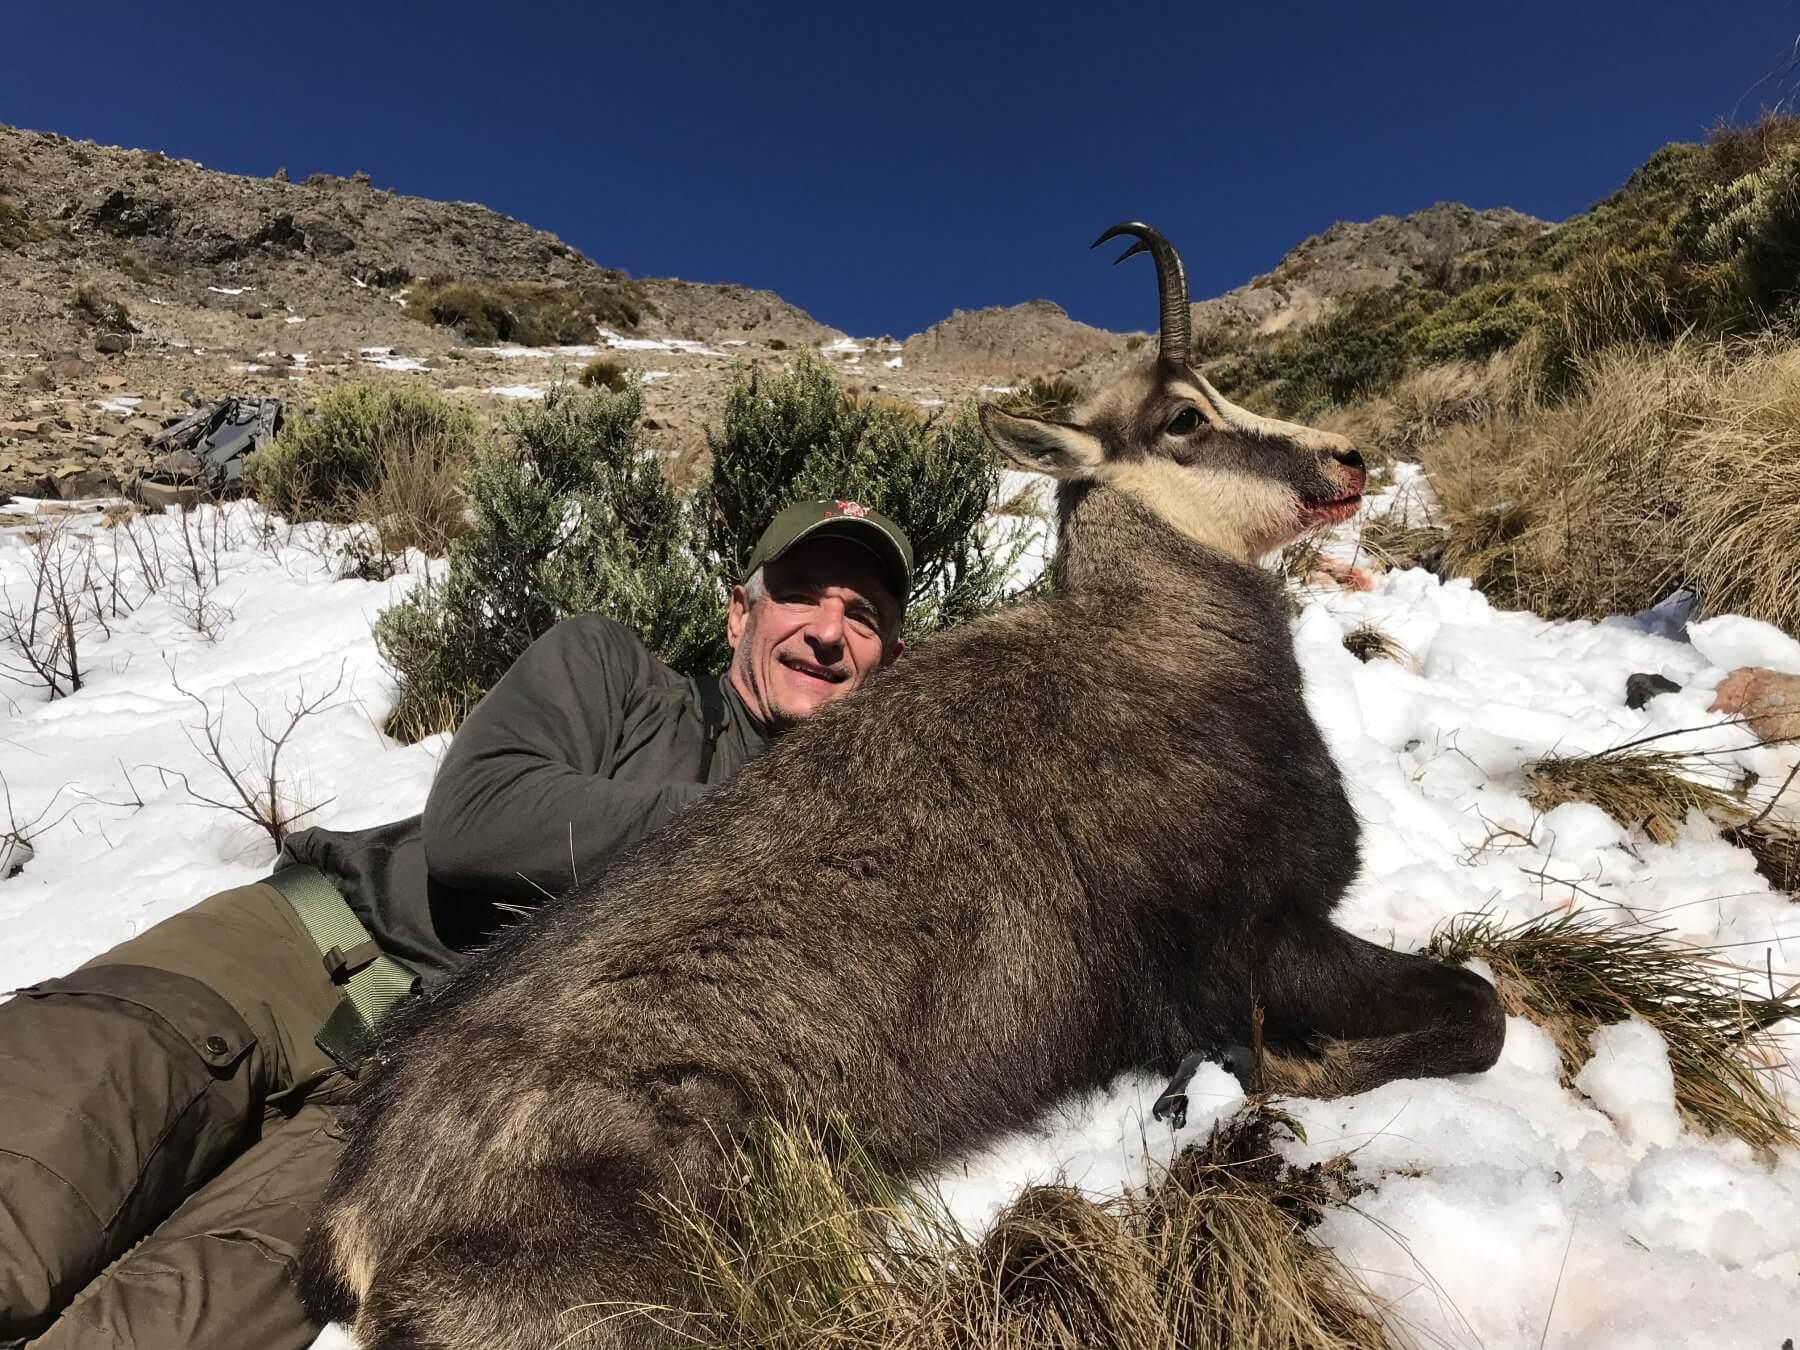 NZ Mountain Antelope-Chamois